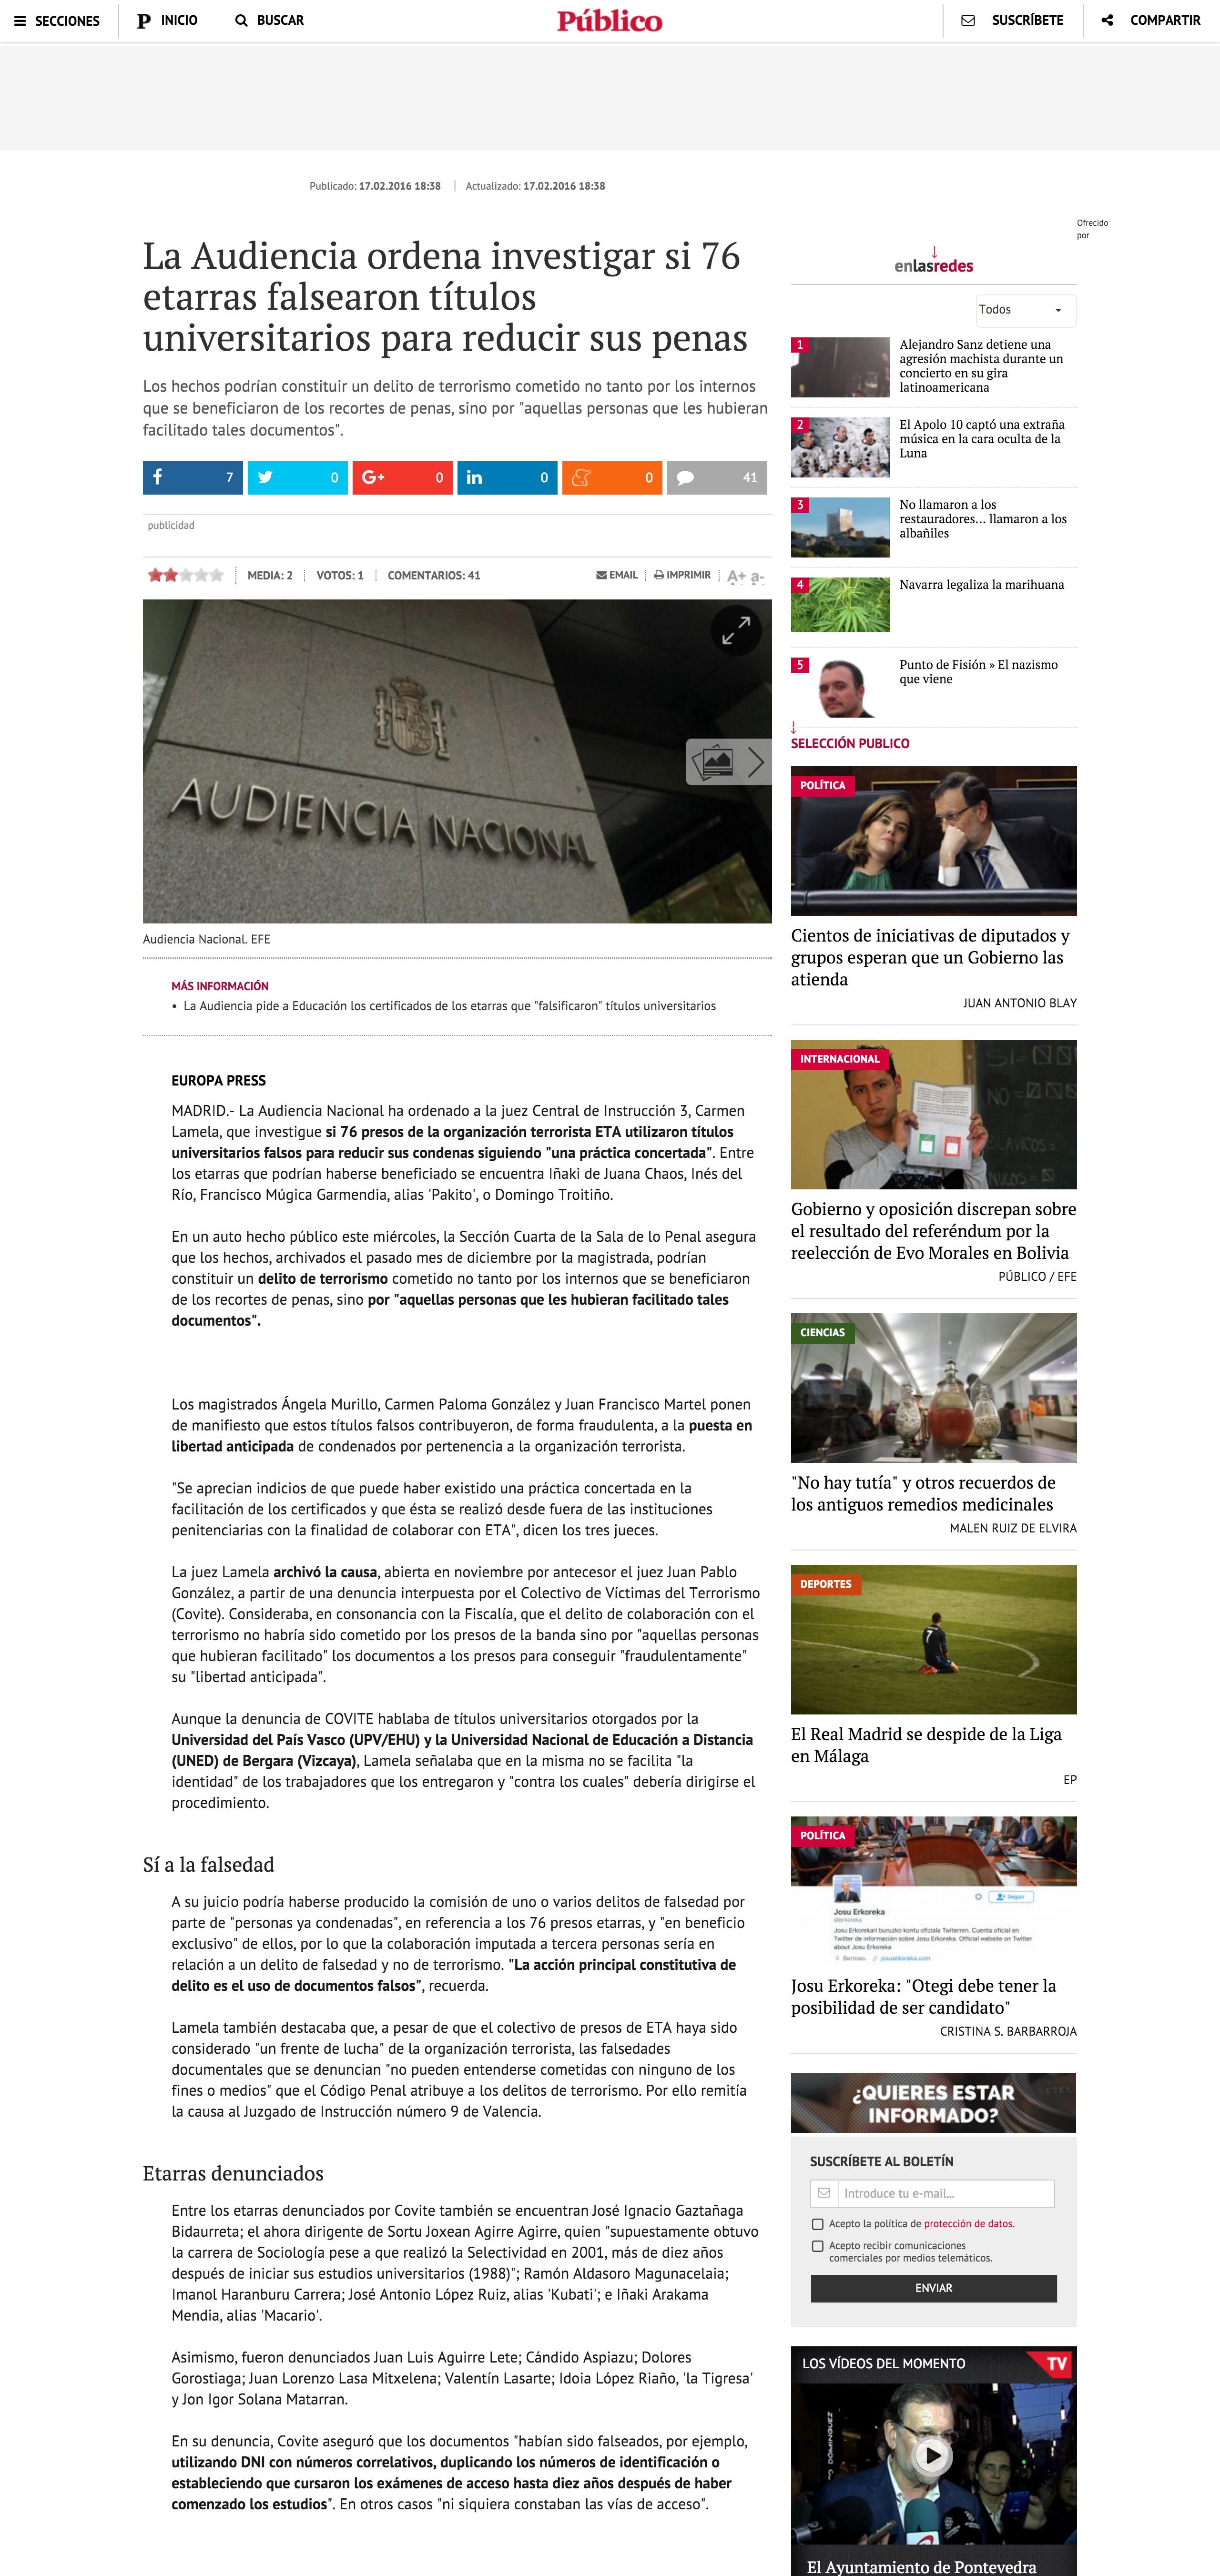 screencapture-www-publico-es-espana-audiencia-nacional-ordena-investigar-76-html-1456142943025